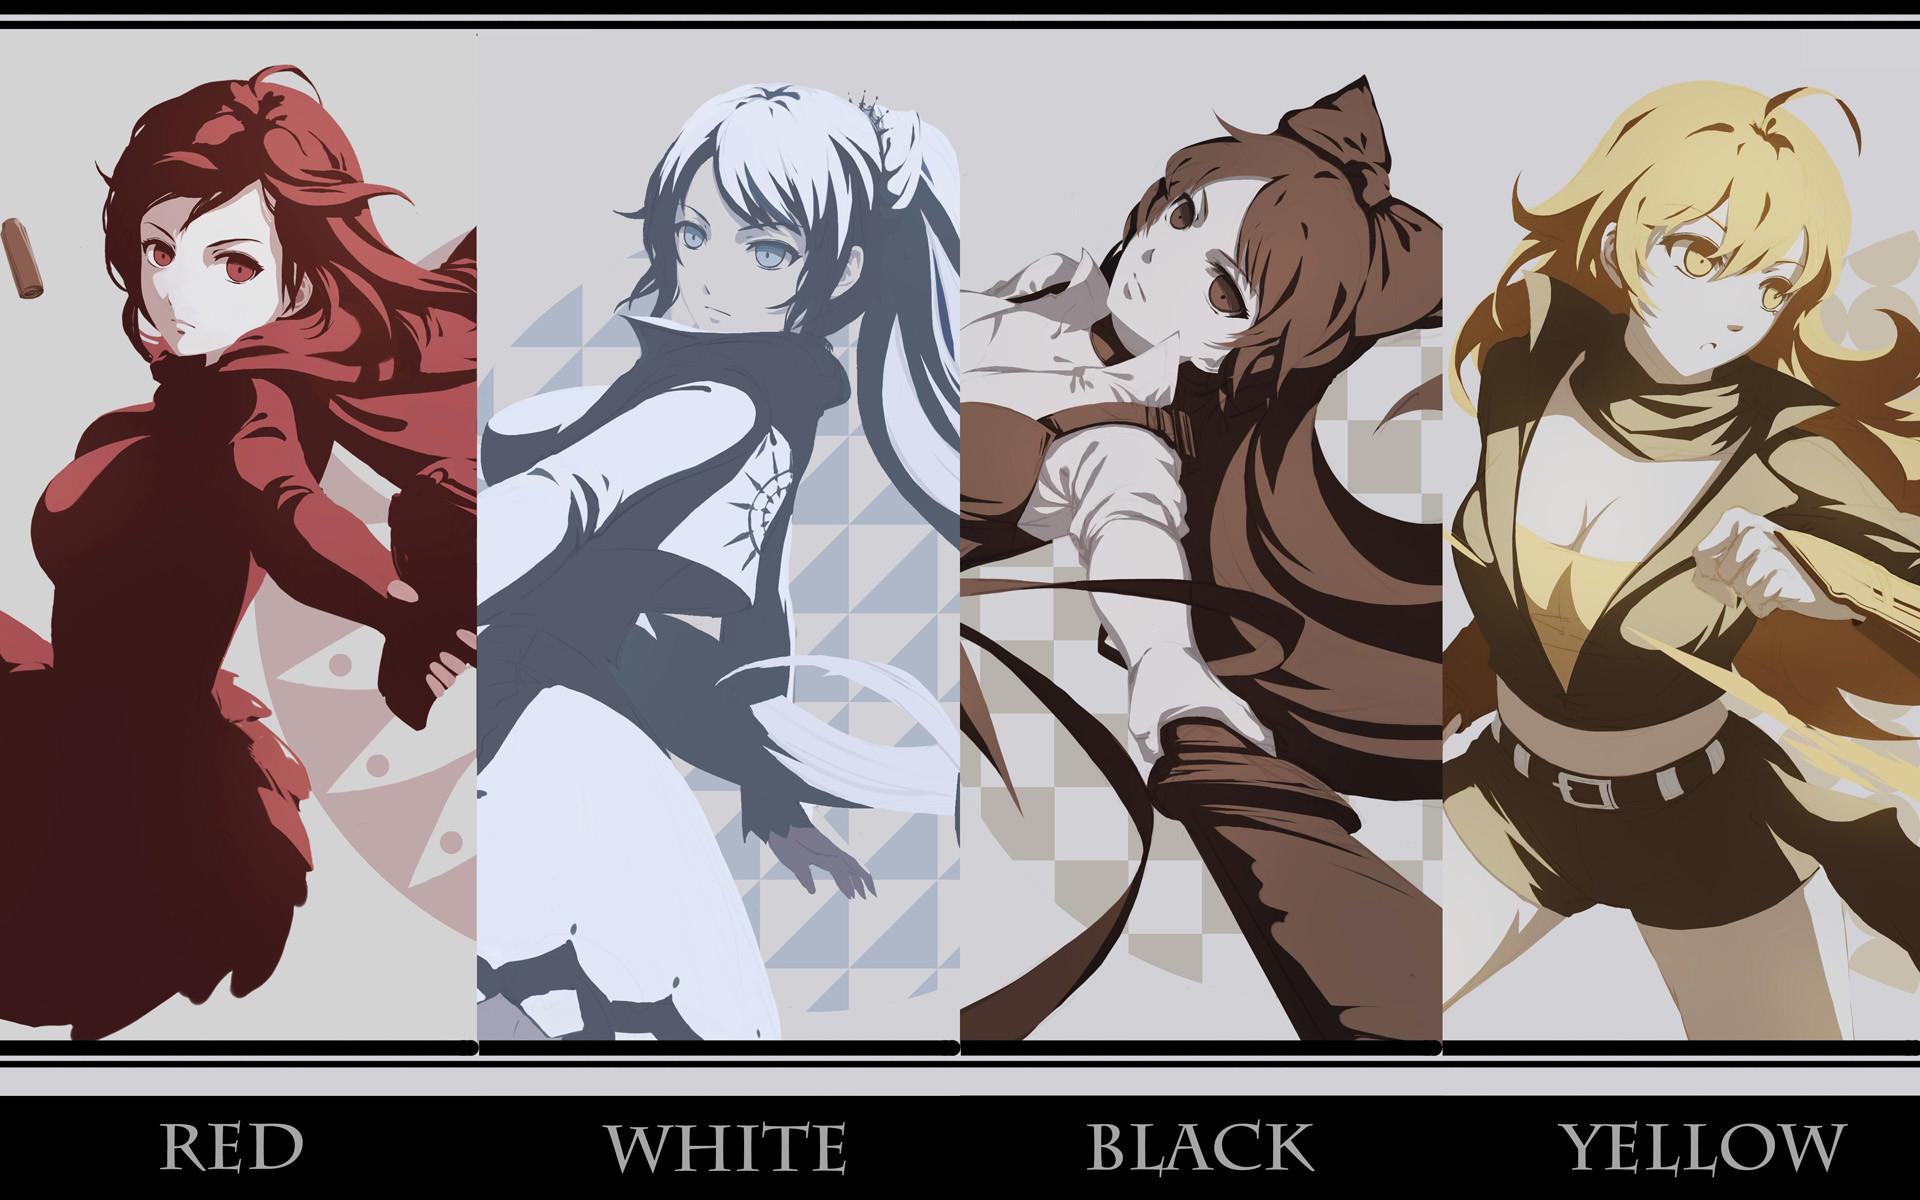 Anime RWBY Ruby Rose Weiss Schnee Blake Belladonna Yang Xiao Long Wallpaper